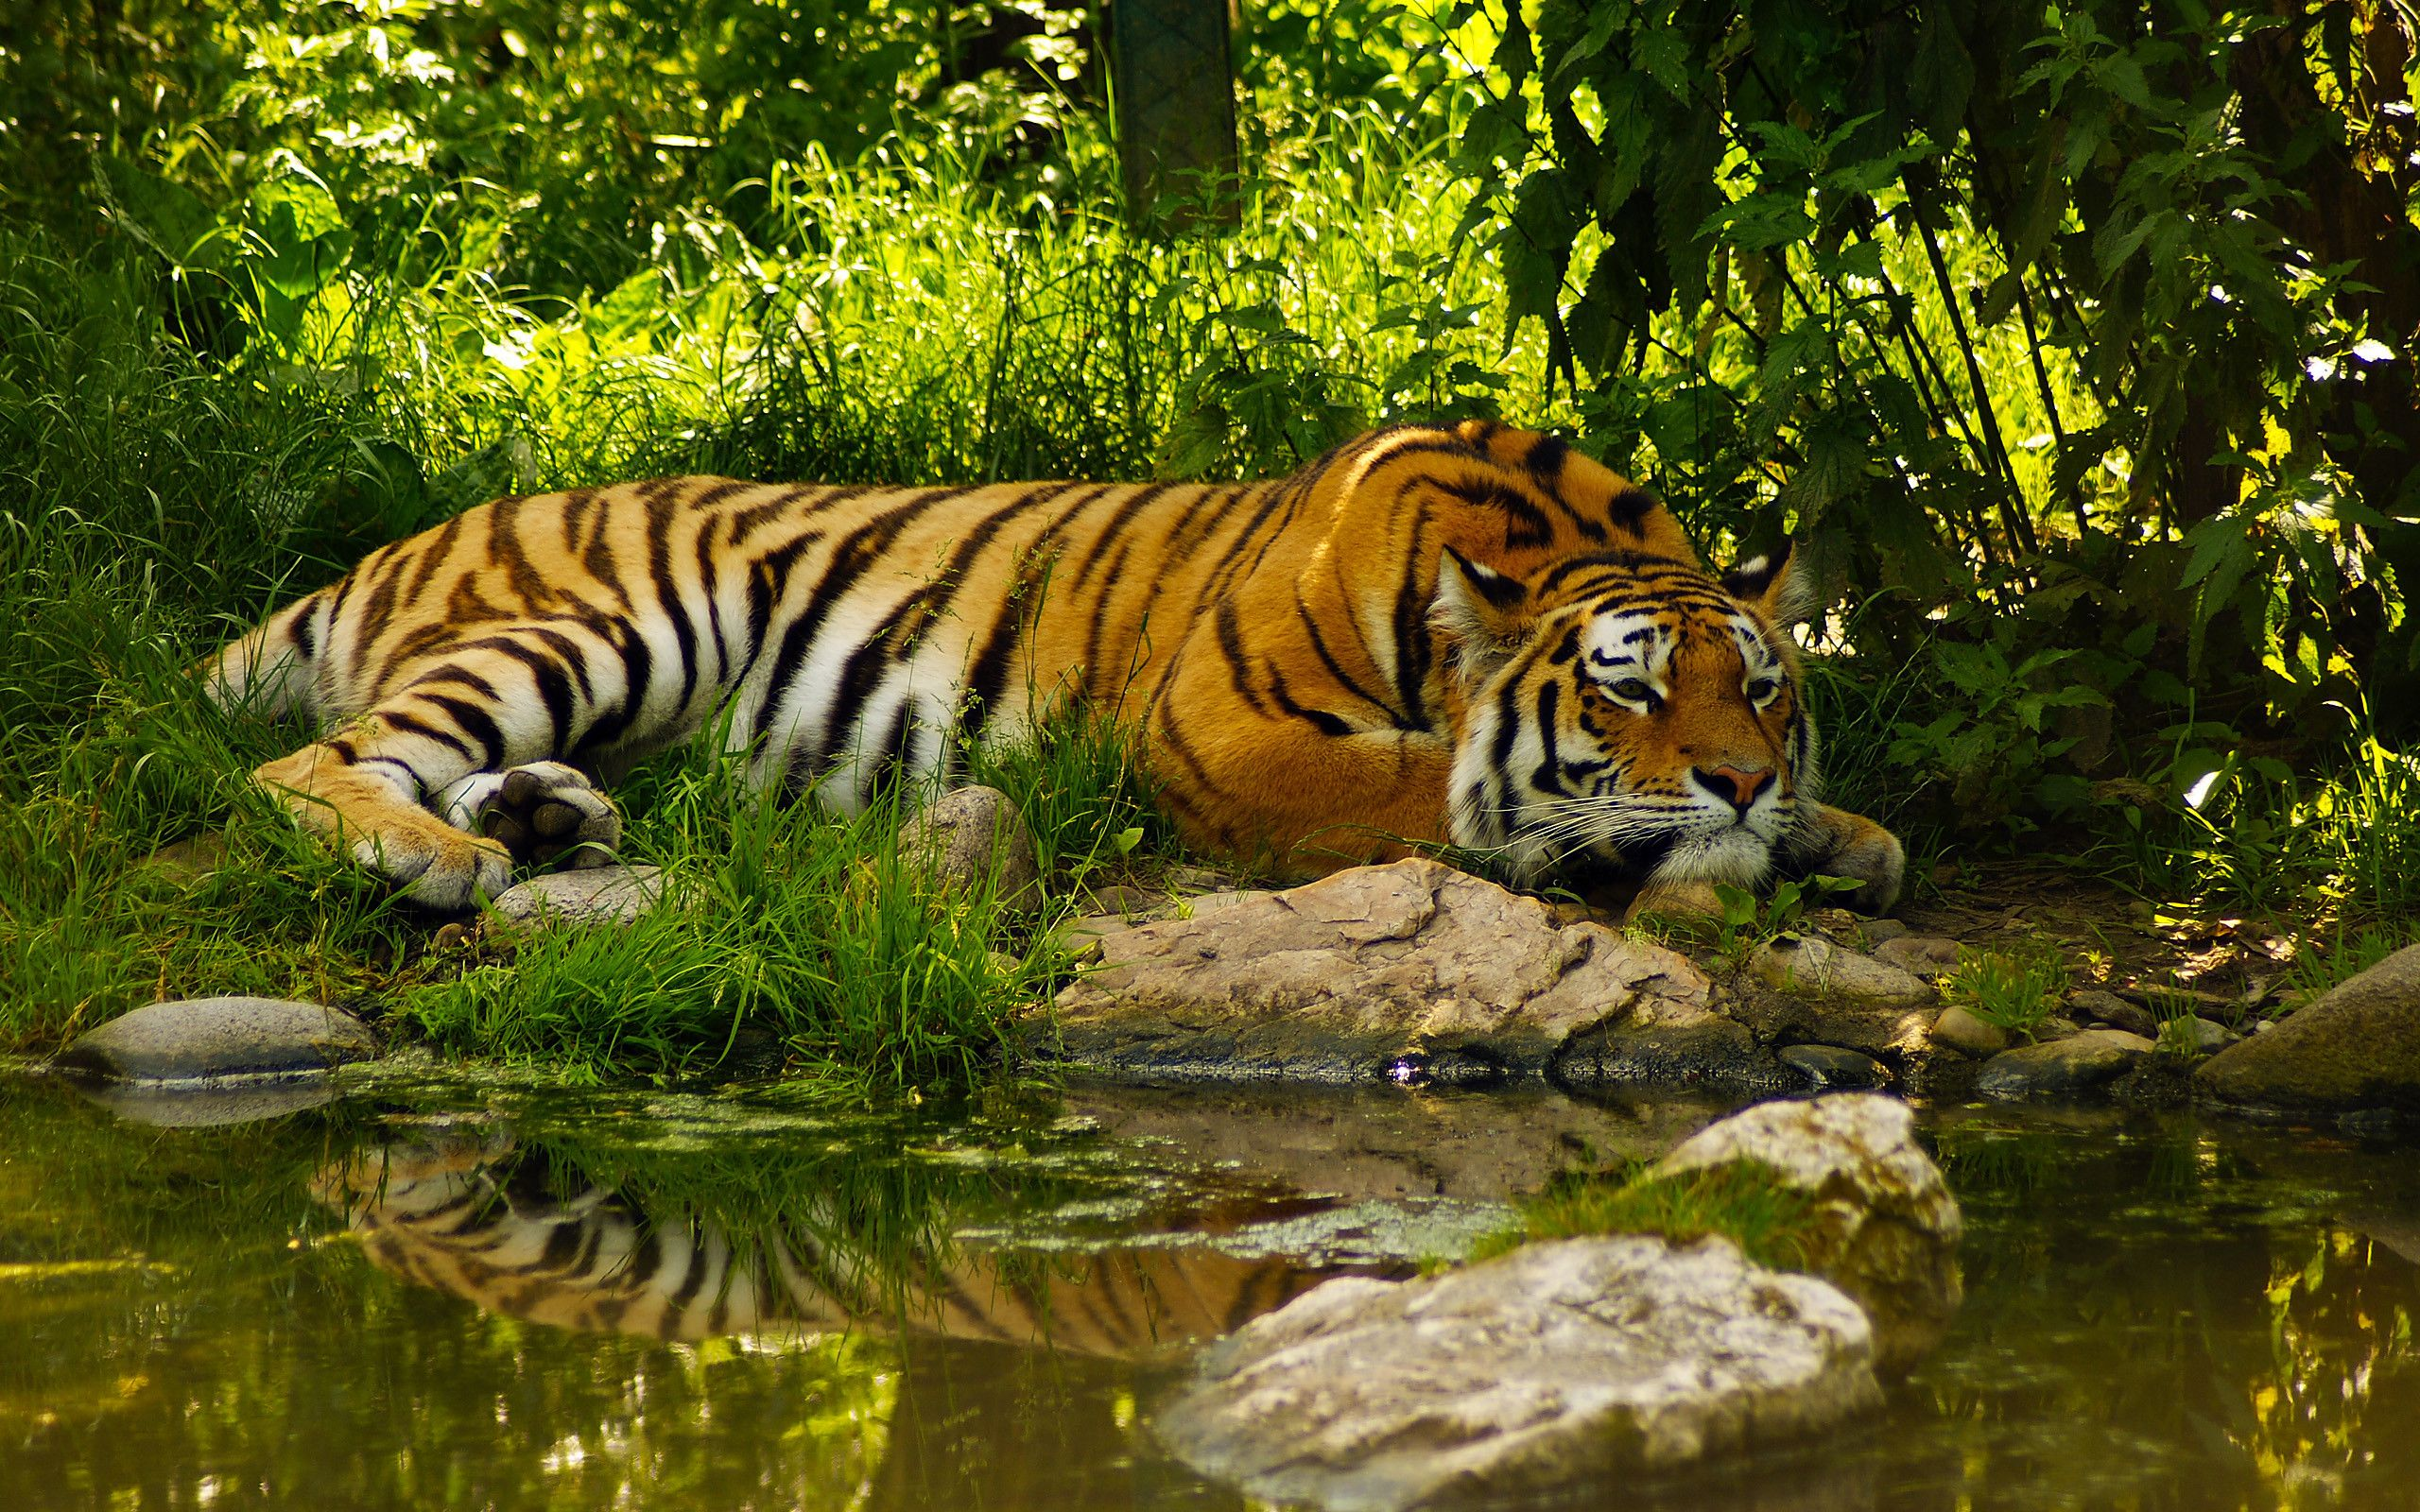 Nature Scenes With Animals Nature Scenes With Animals 2560x1600 Pixel Tiger Wallpaper Animal Wallpaper Nature Animals